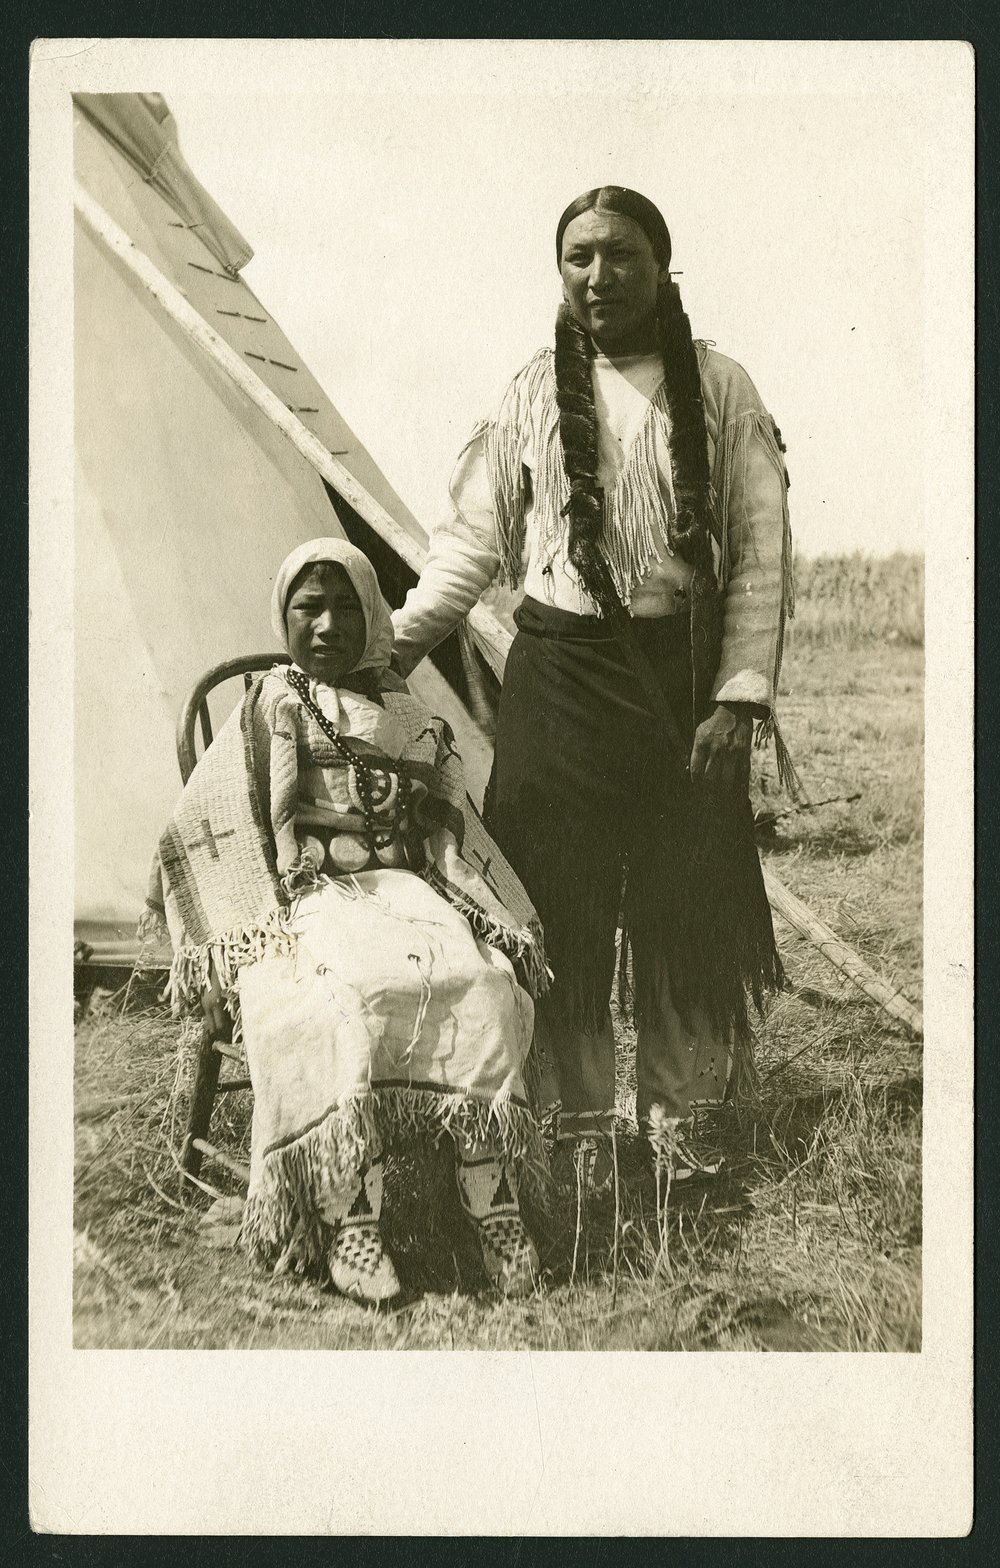 Paul Little Man, Cheyenne Indian - 1